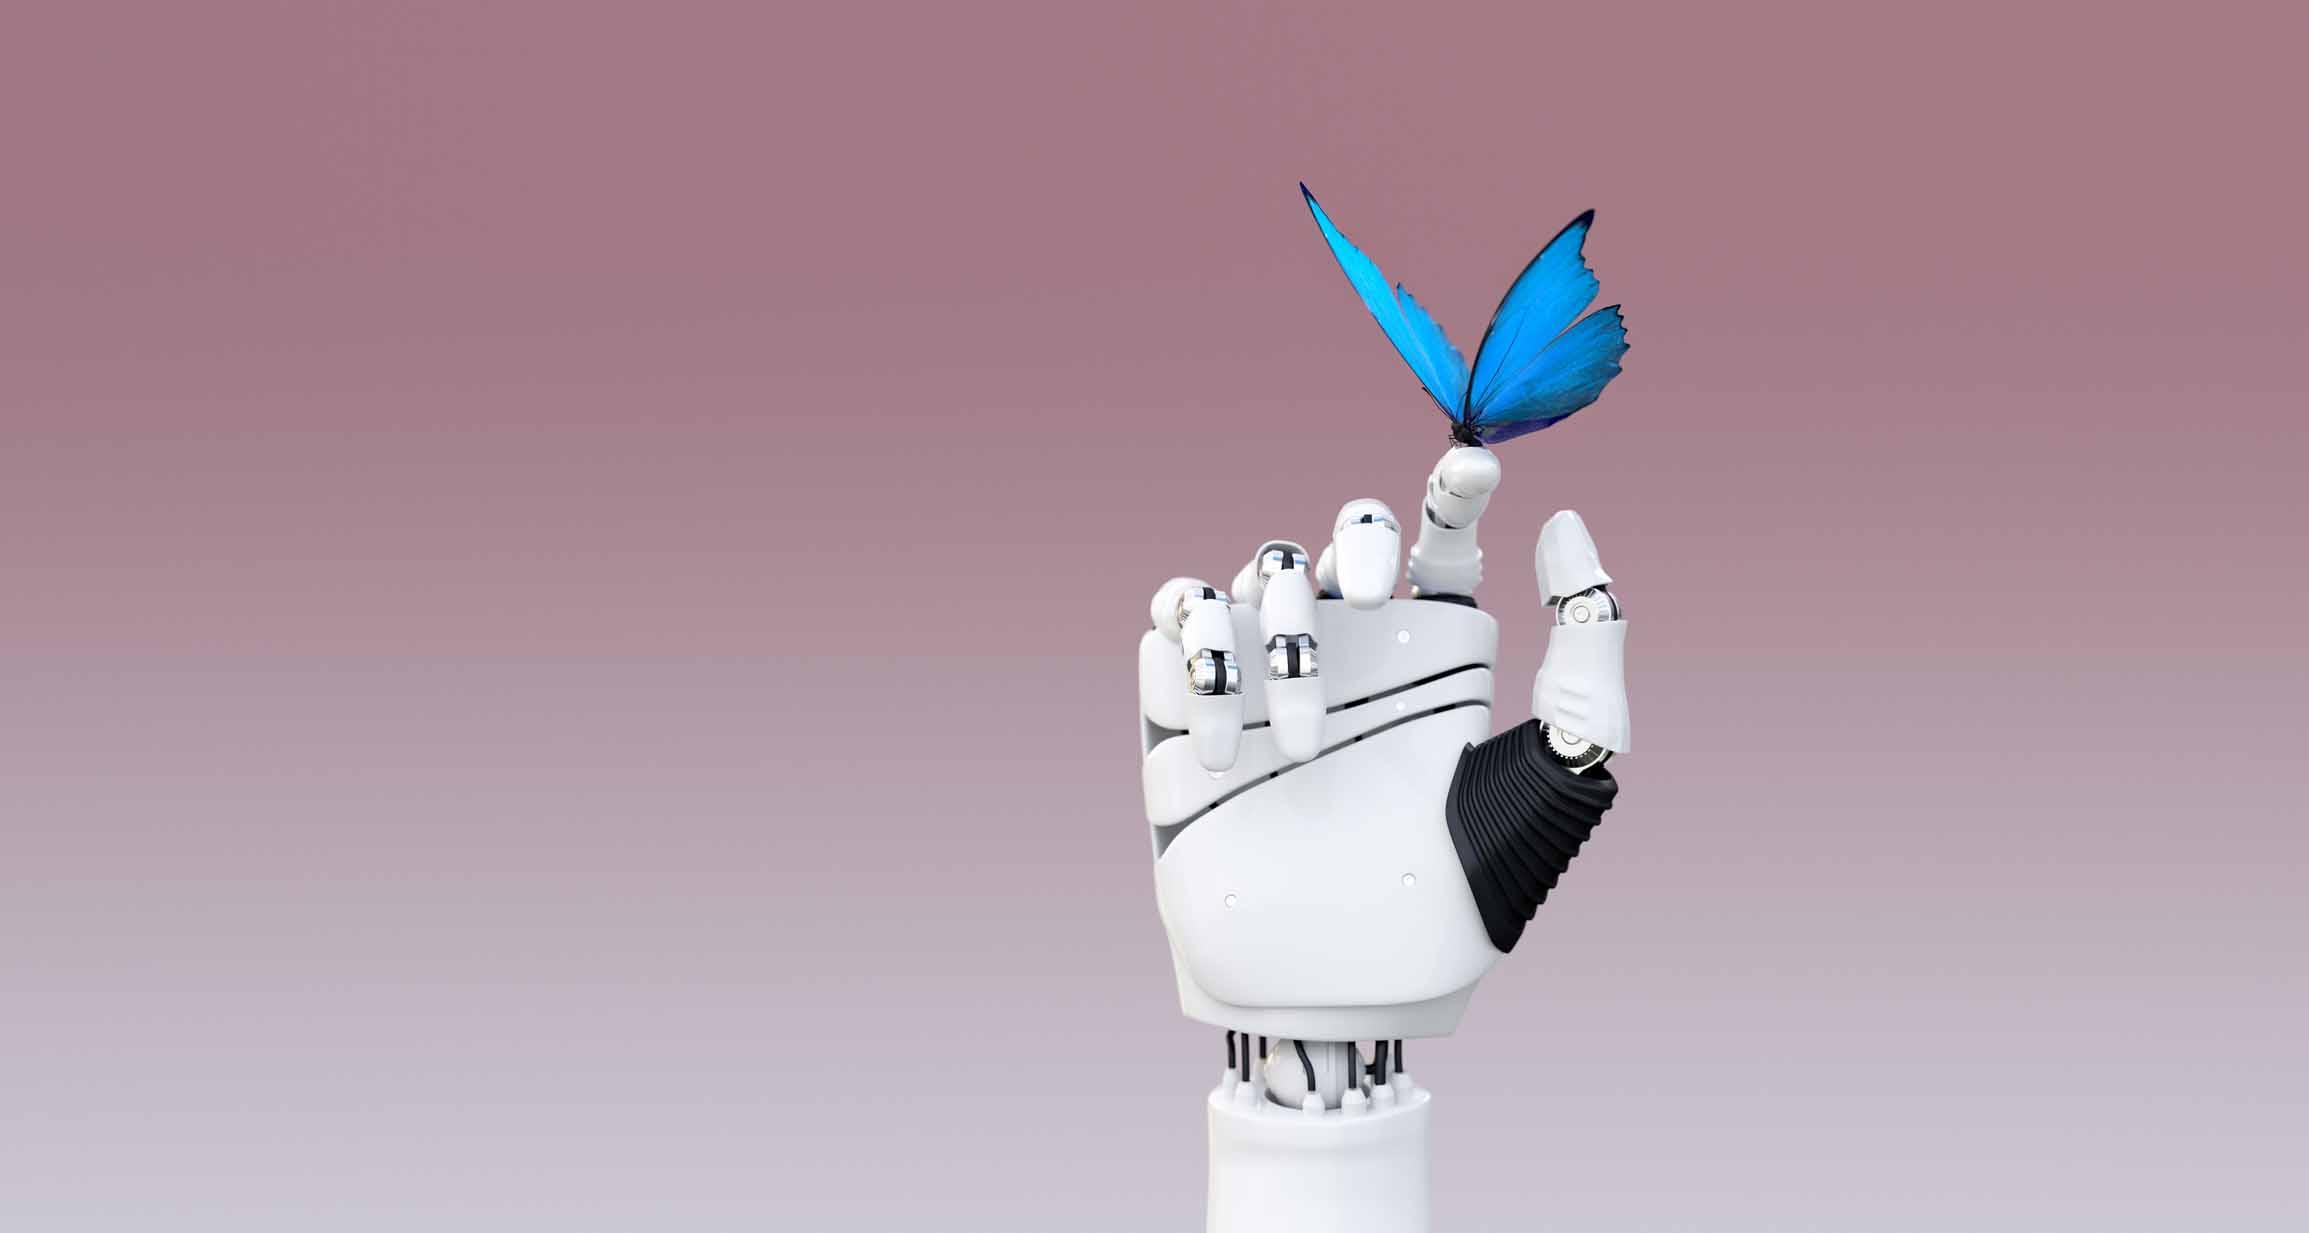 Getting Digital Transformation Right Through AI & Analytics